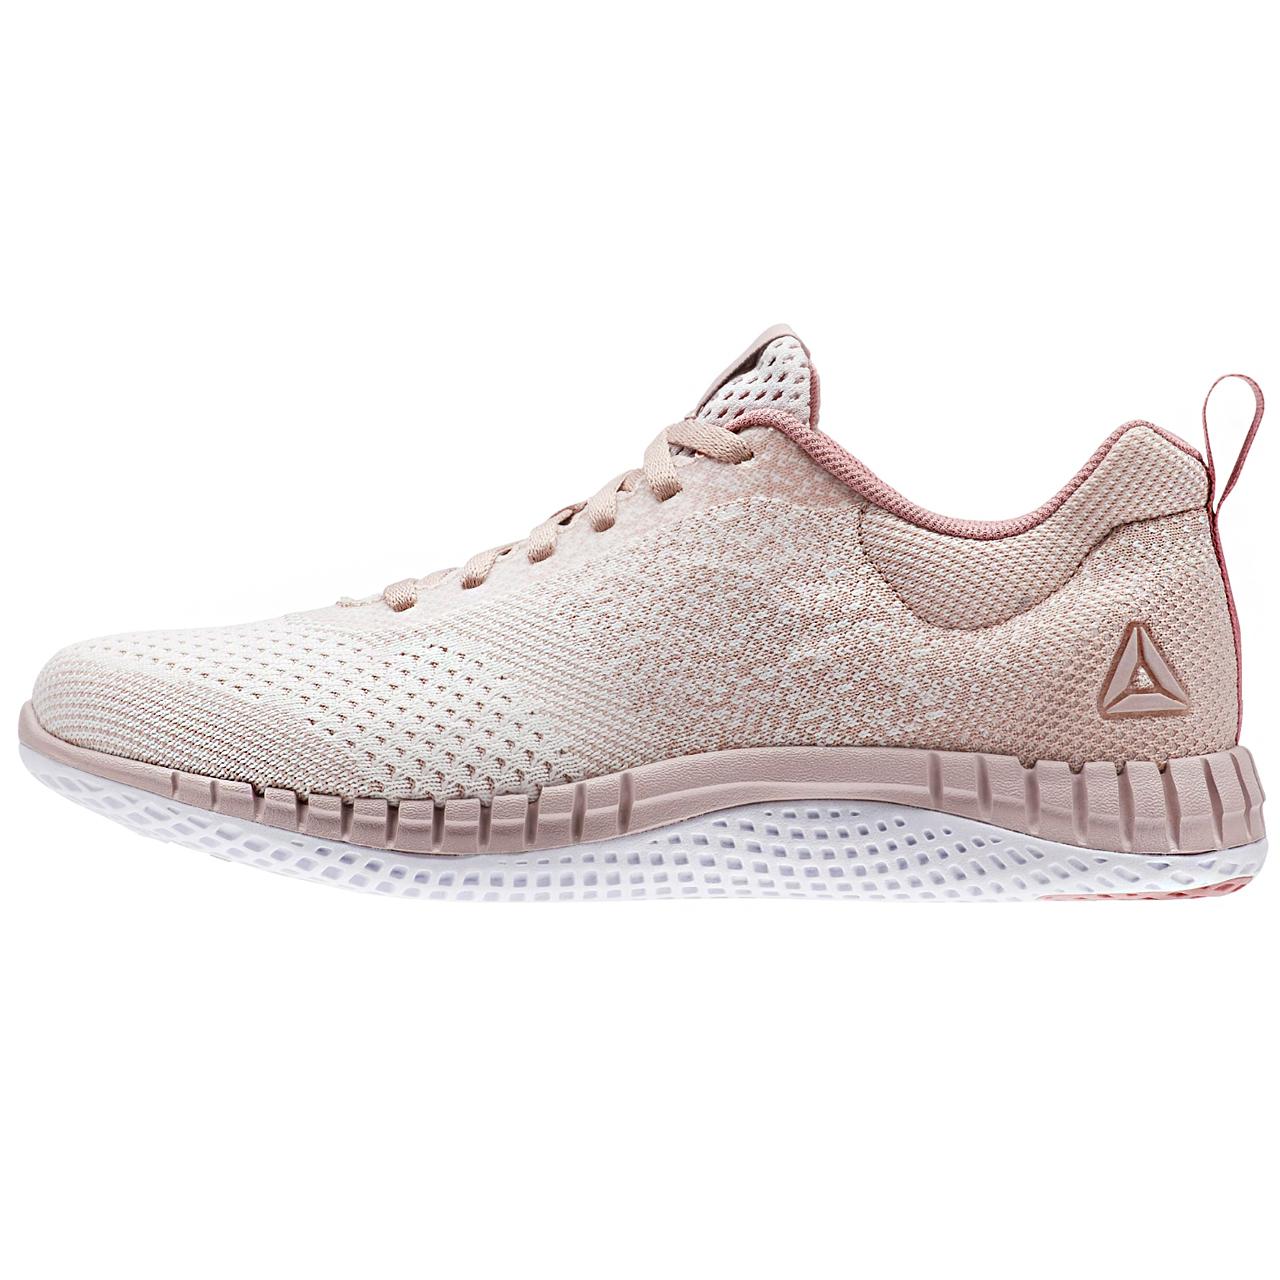 کفش مخصوص دویدن زنانه ریباک مدل Print Run Prime Ultraknit BS6978